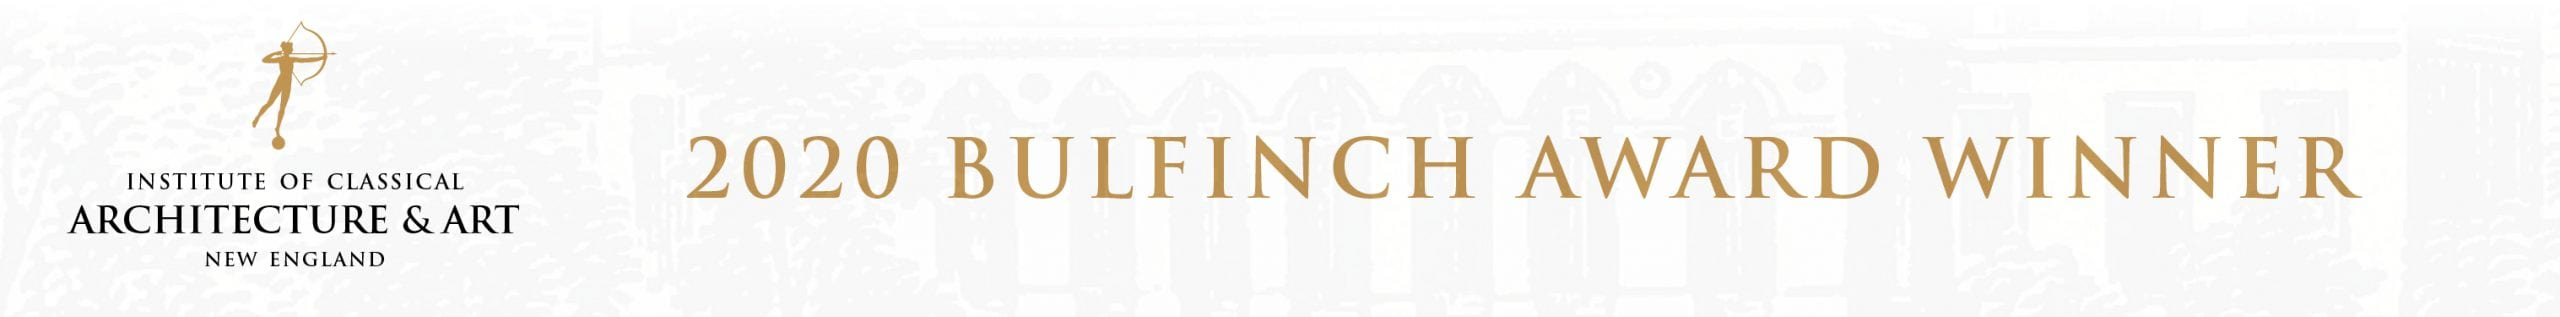 2020 Bulfinch Award Winner